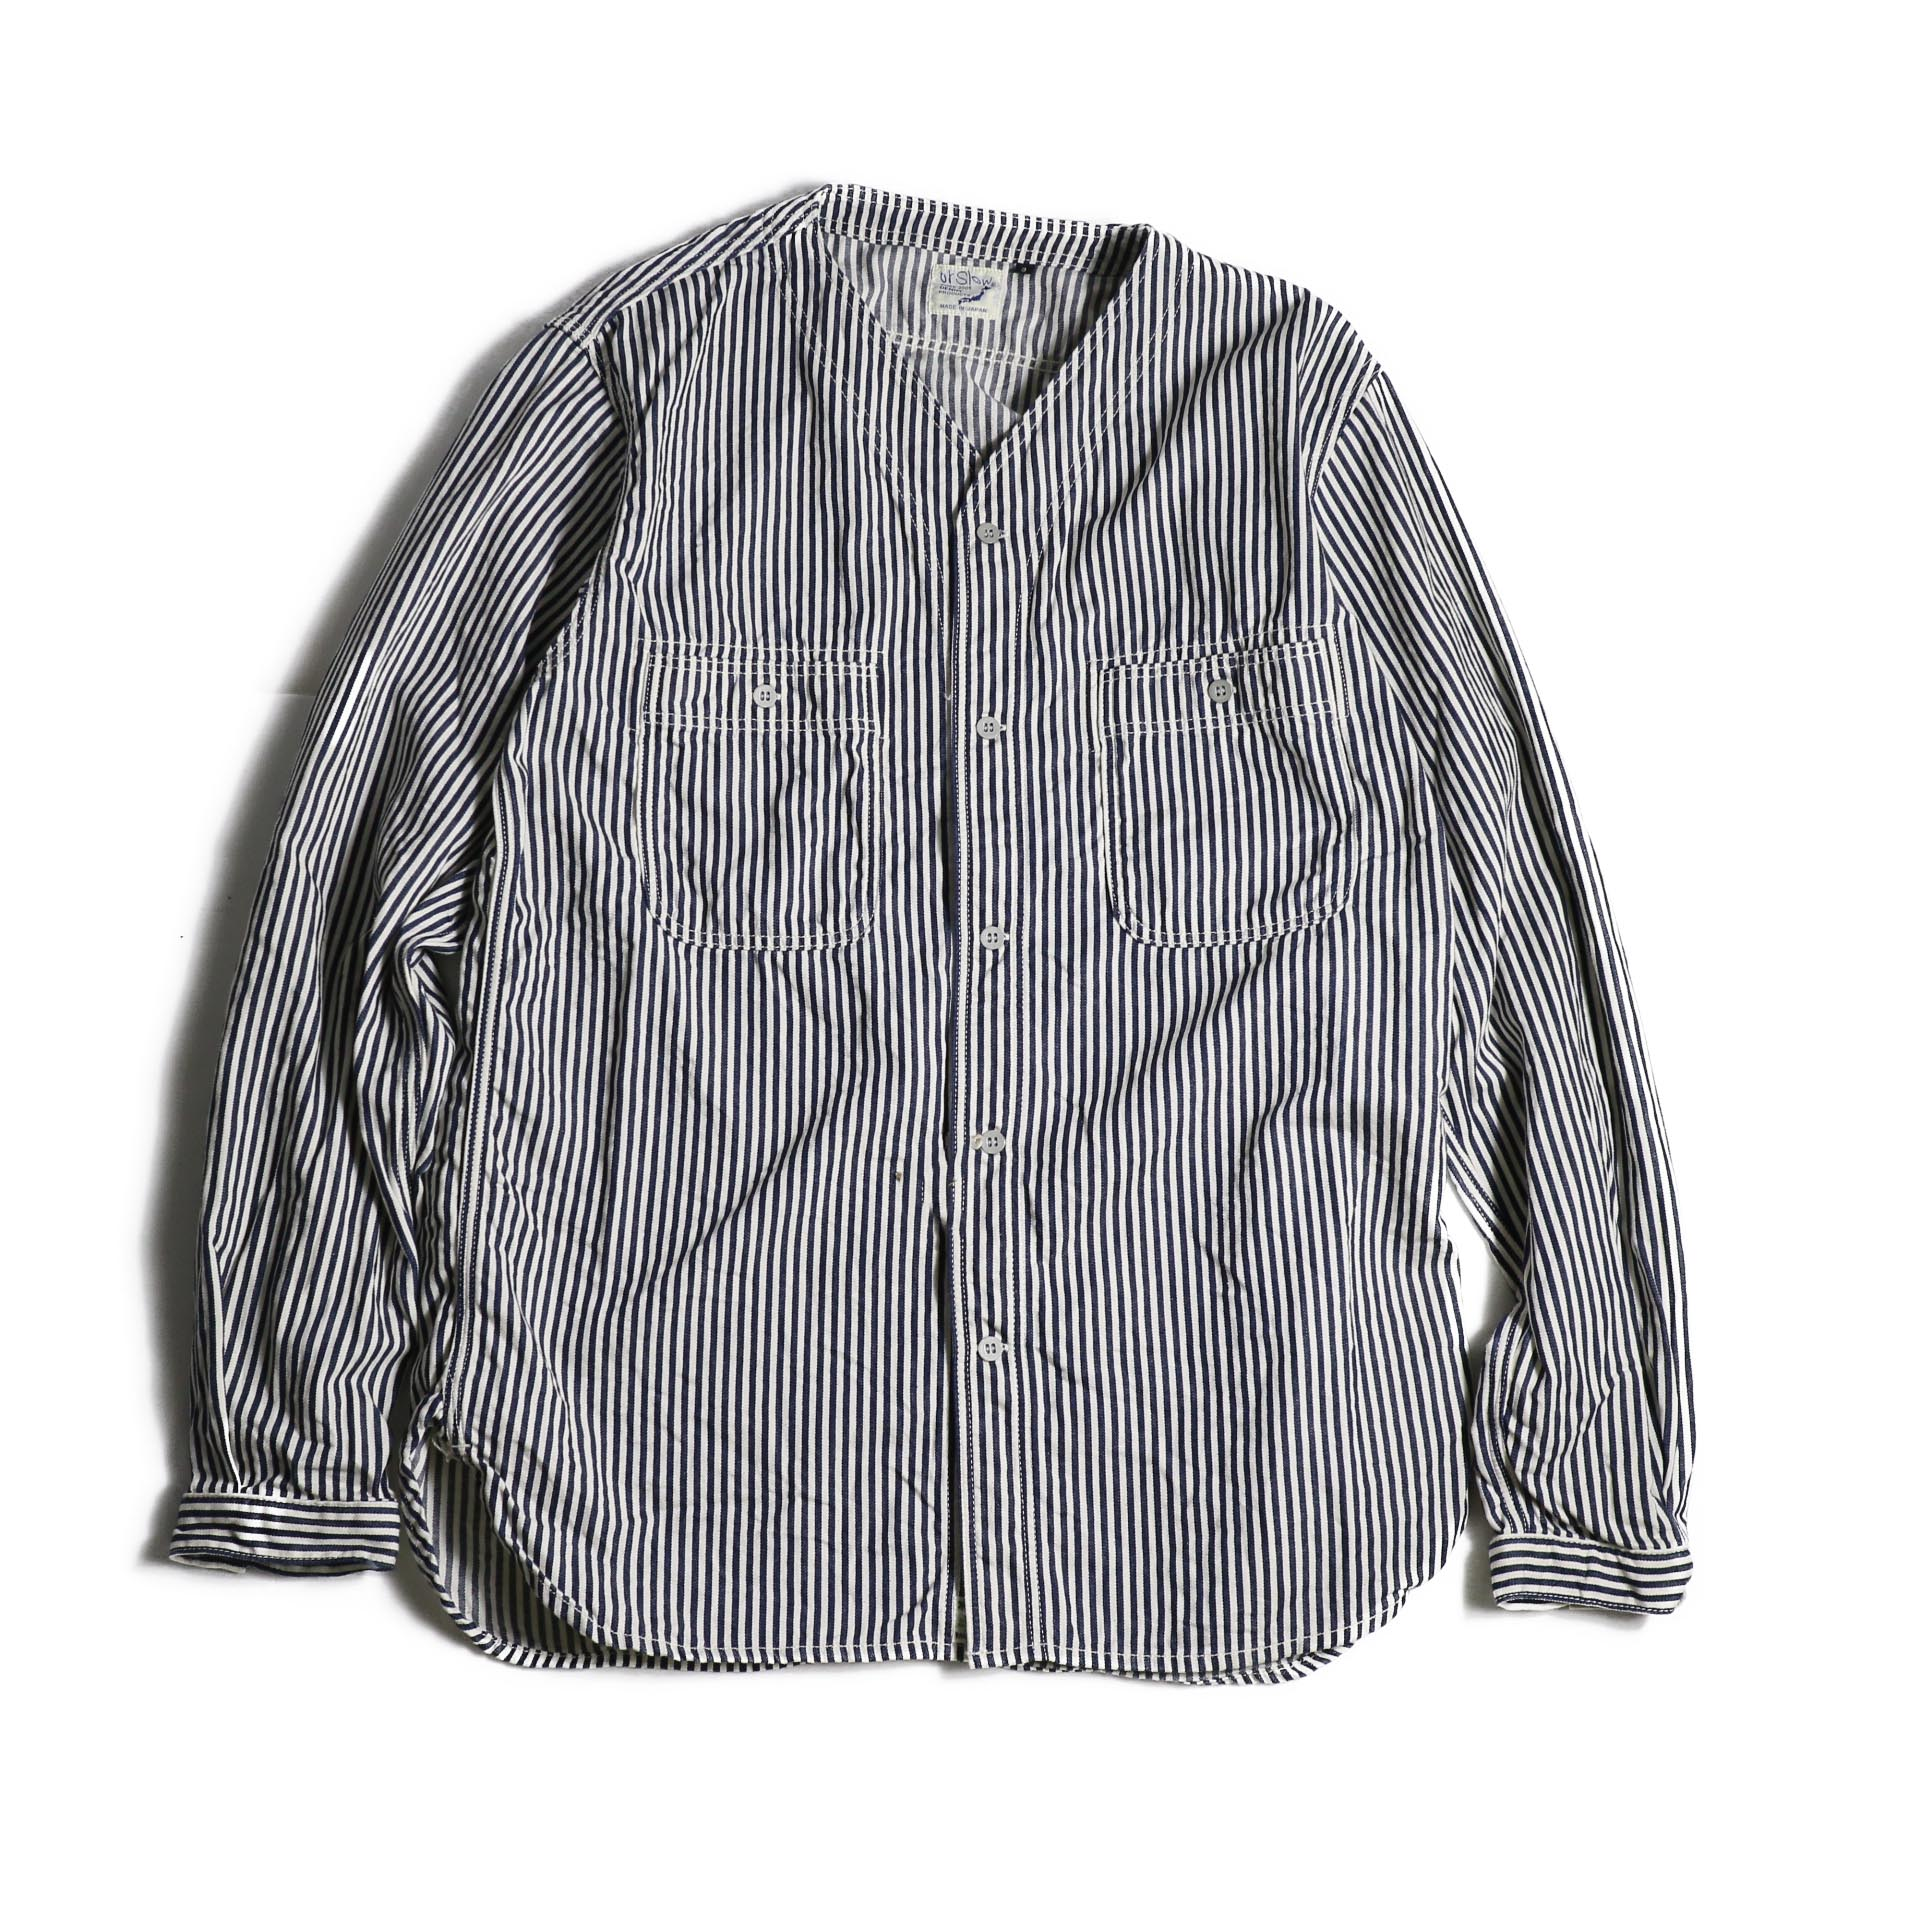 orSlow / NO COLLAR SHIRT (Hickory Stripe)